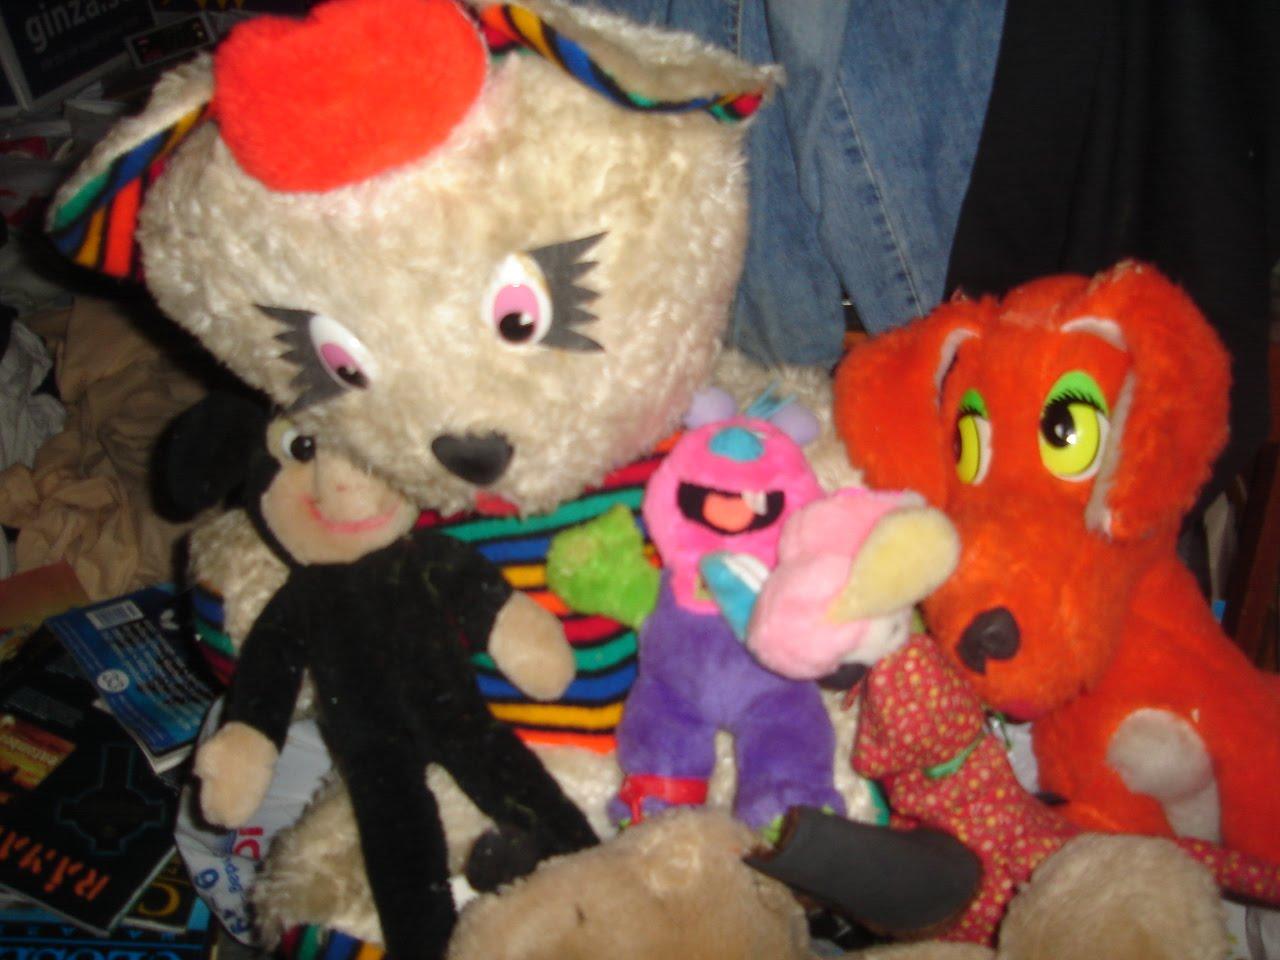 http://2.bp.blogspot.com/_PlGAV1RT_pc/TMnPEV2BP1I/AAAAAAAABpE/MKAE8L1l8RM/s1600/djur.JPG